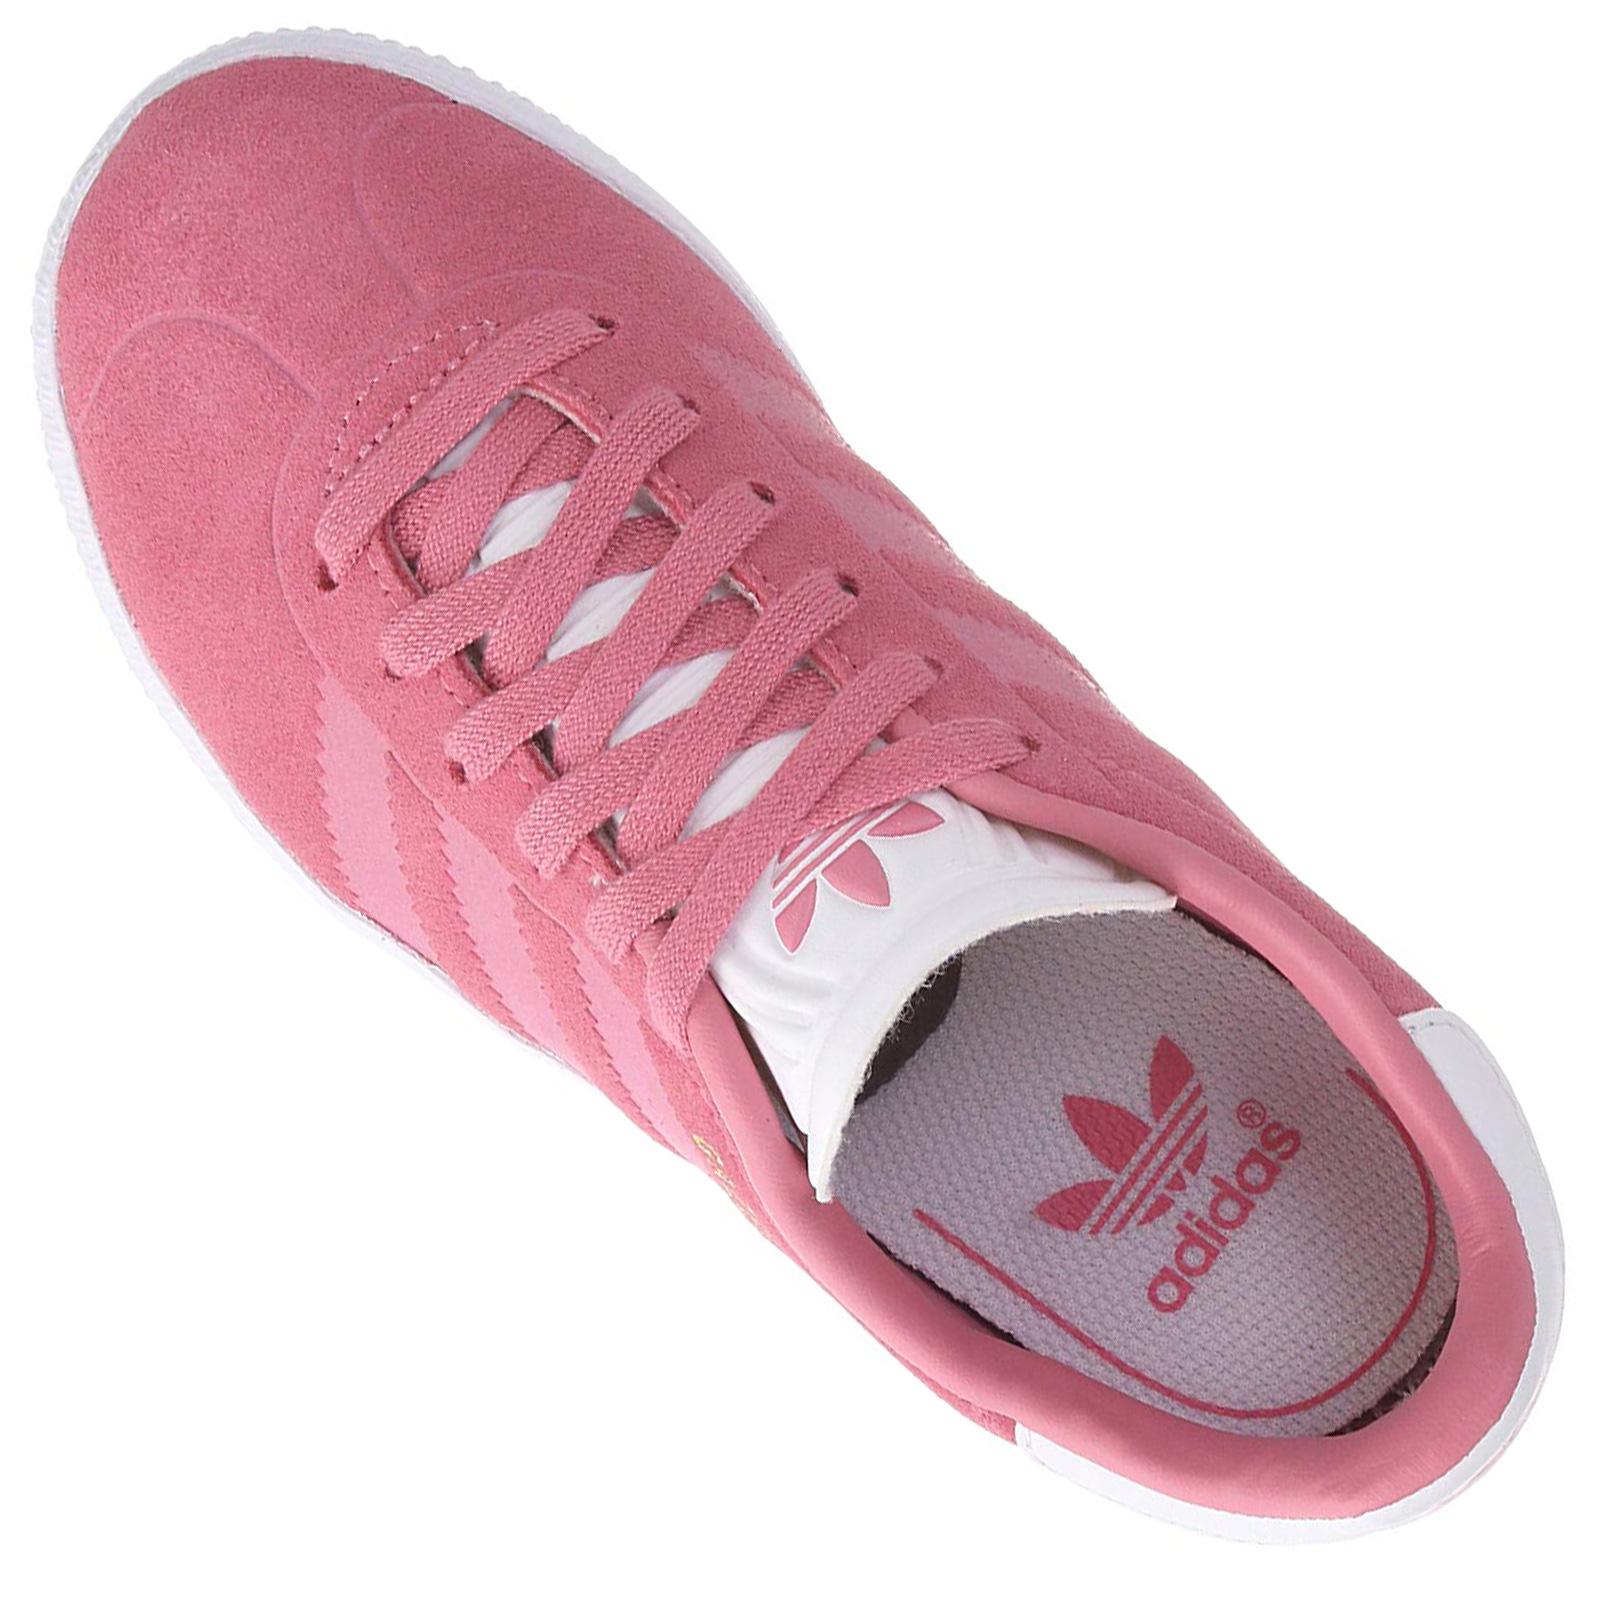 gut offizielle Bilder reich und großartig adidas Originals Gazelle Damen Sneaker Turnschuhe Leder Sneaker Pink Weiß  CQ2882